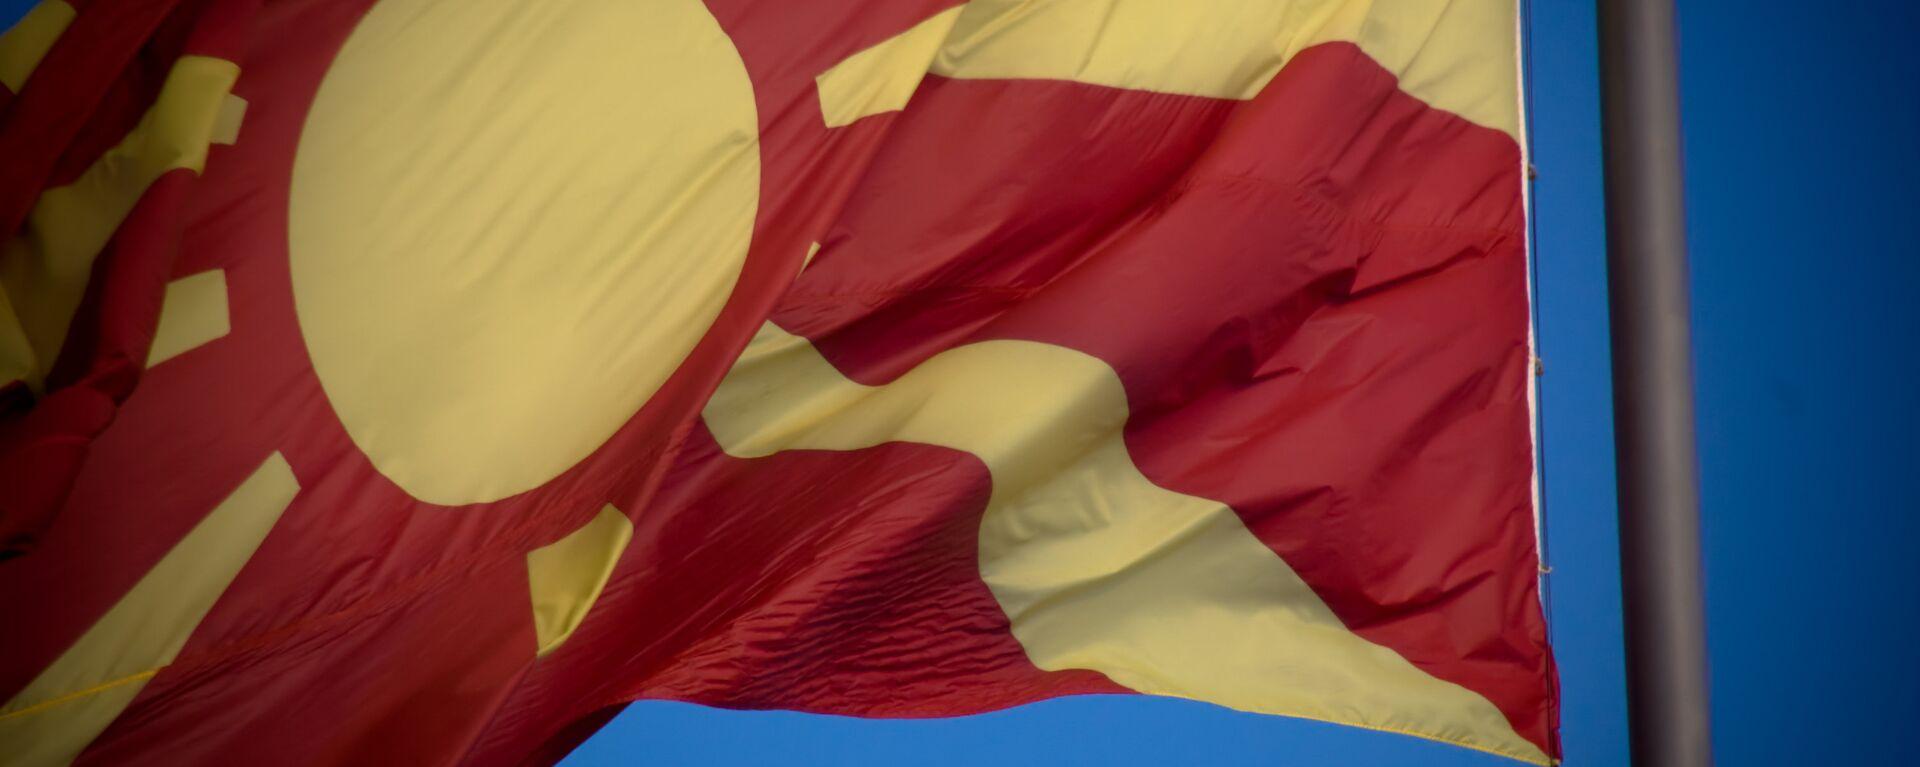 Bandera de Macedonia - Sputnik Mundo, 1920, 19.05.2021